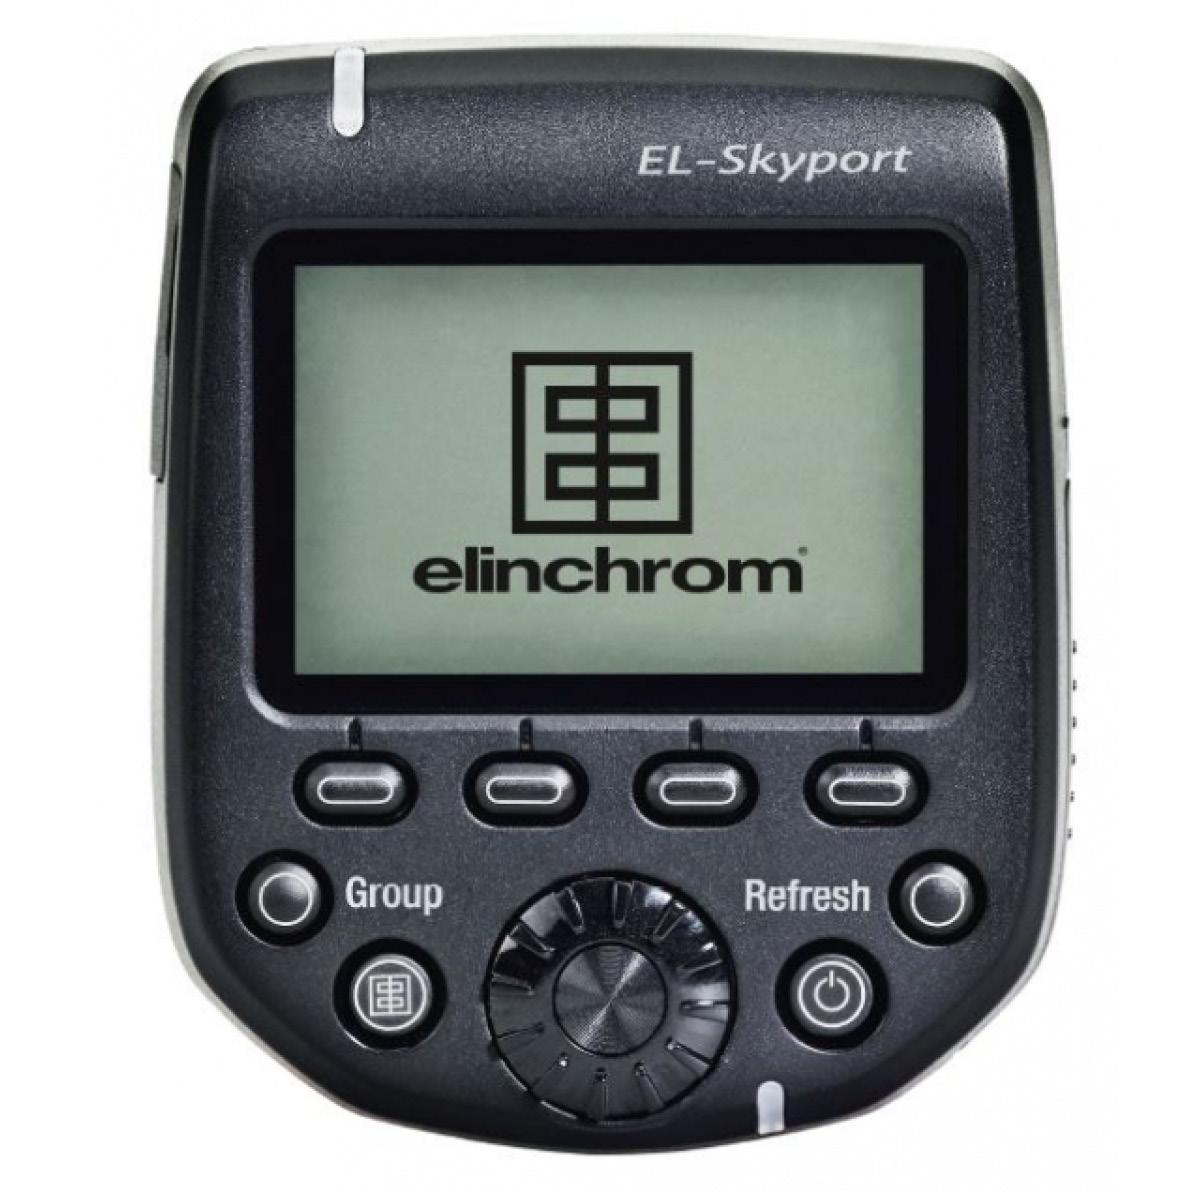 Elinchrom EL - Skyport Transmitter pro für Canon